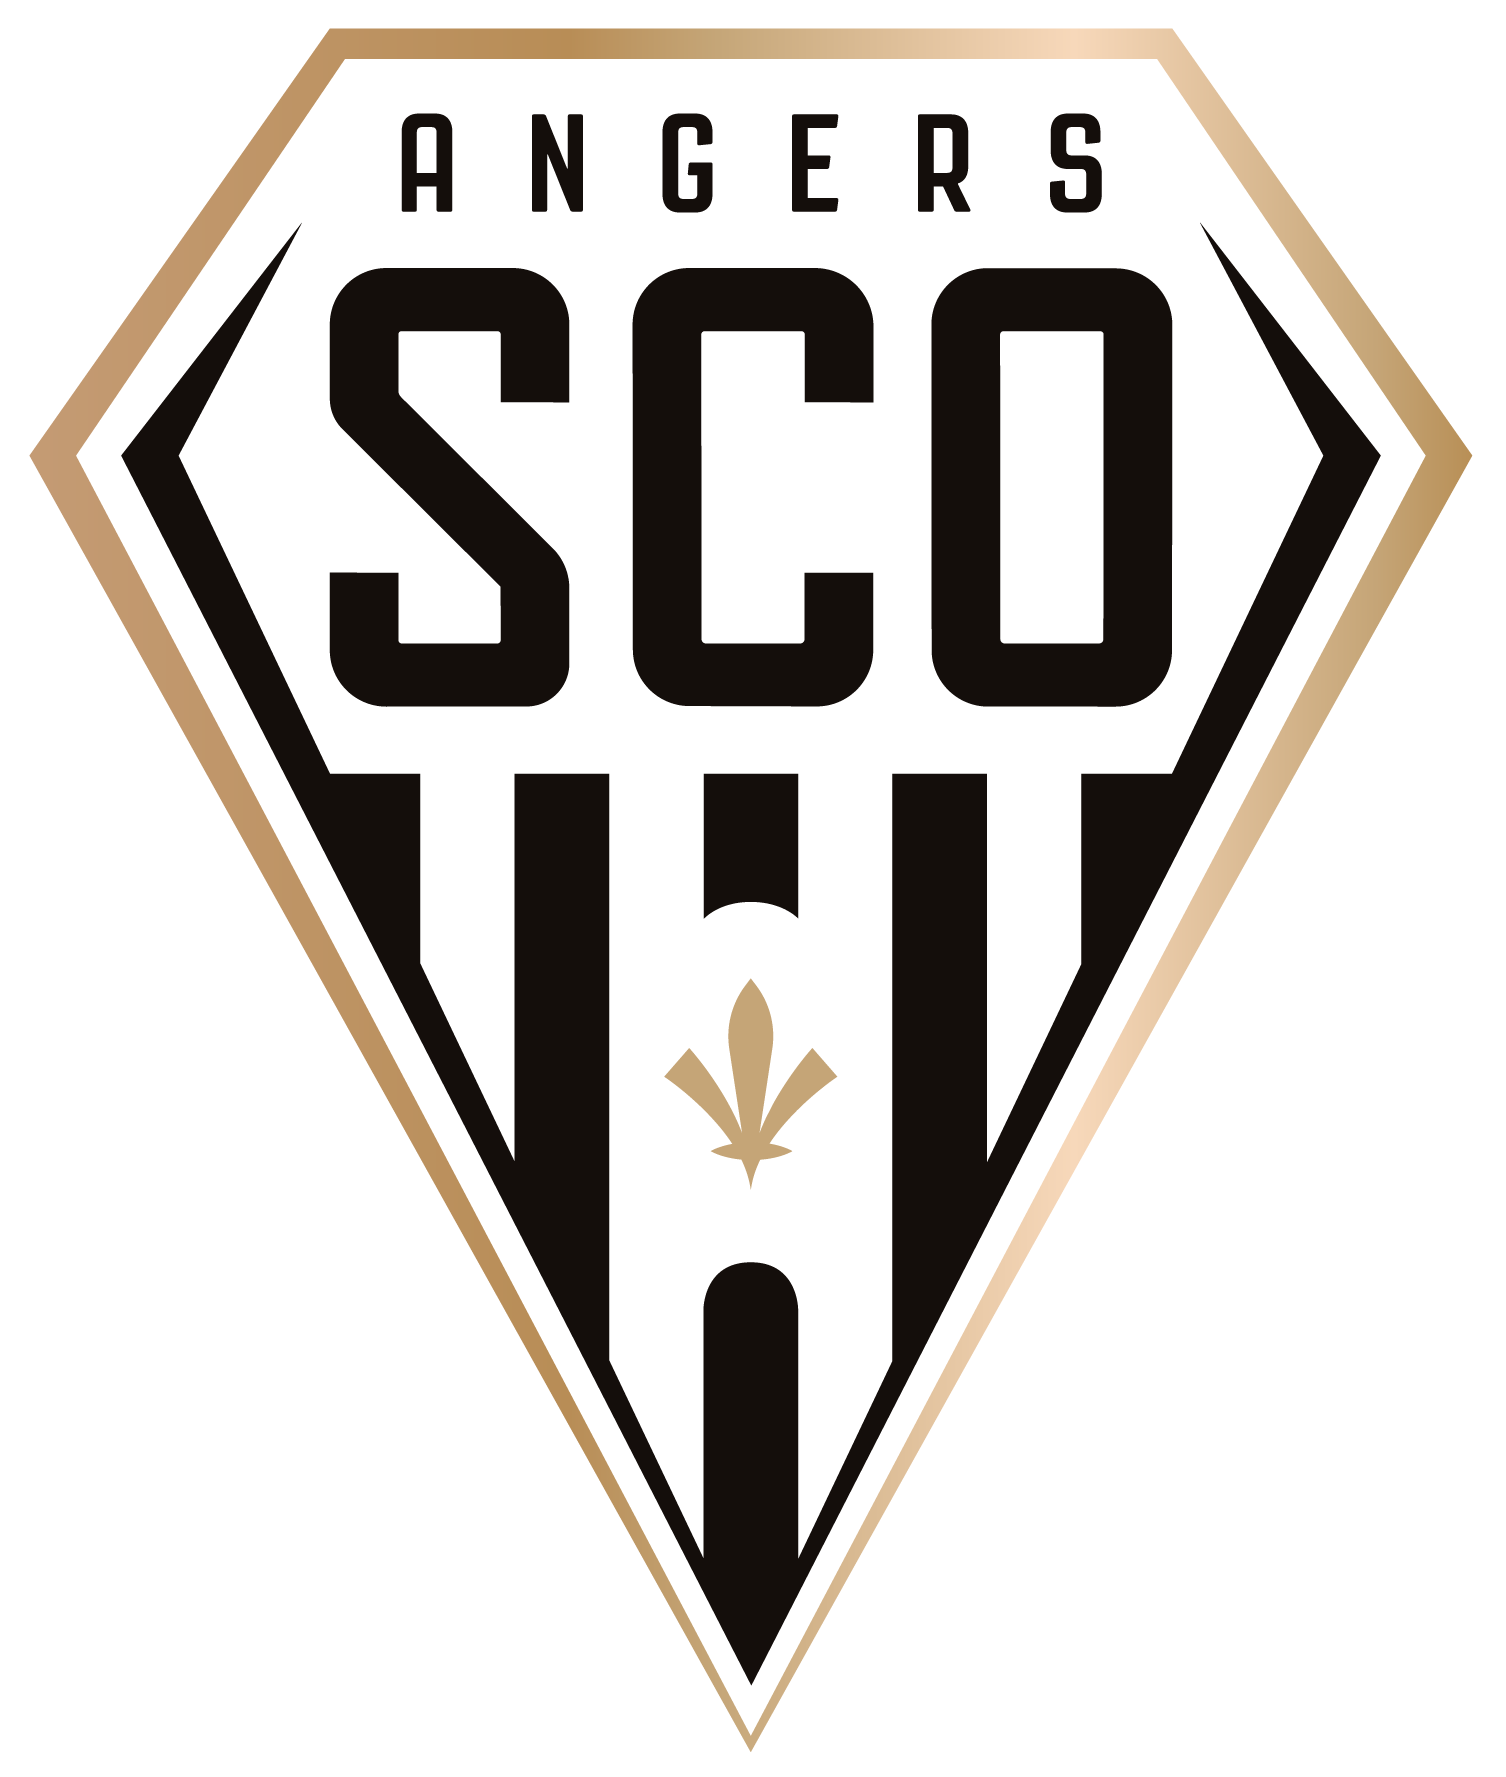 RVB_Angers_SCO-Couleurs_FondBLANC.png